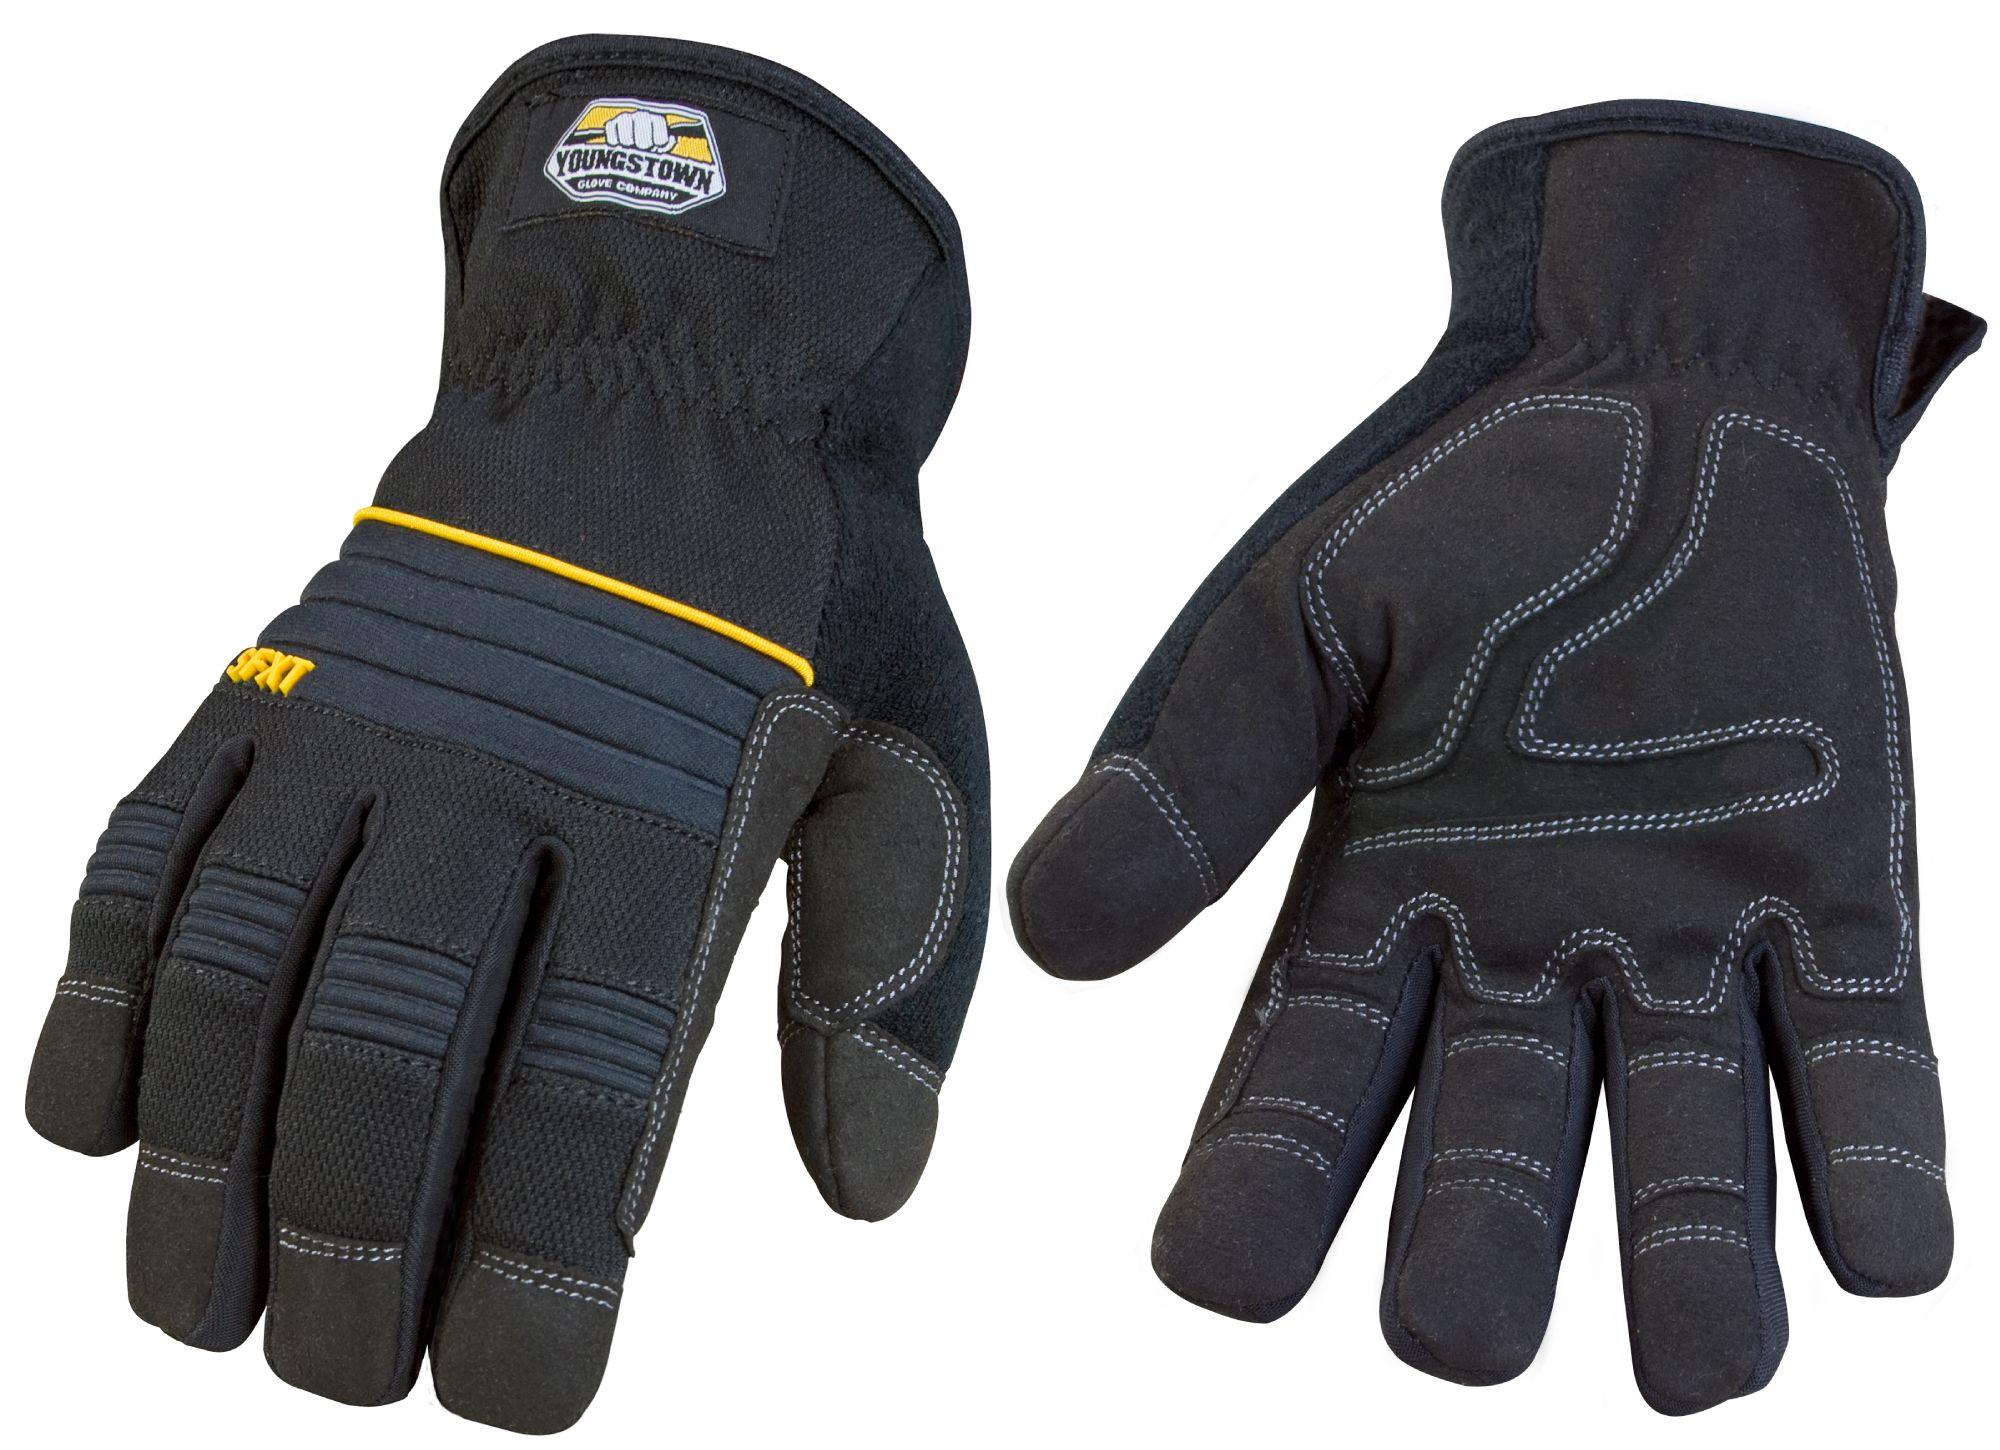 Slip Fit XT Work Gloves